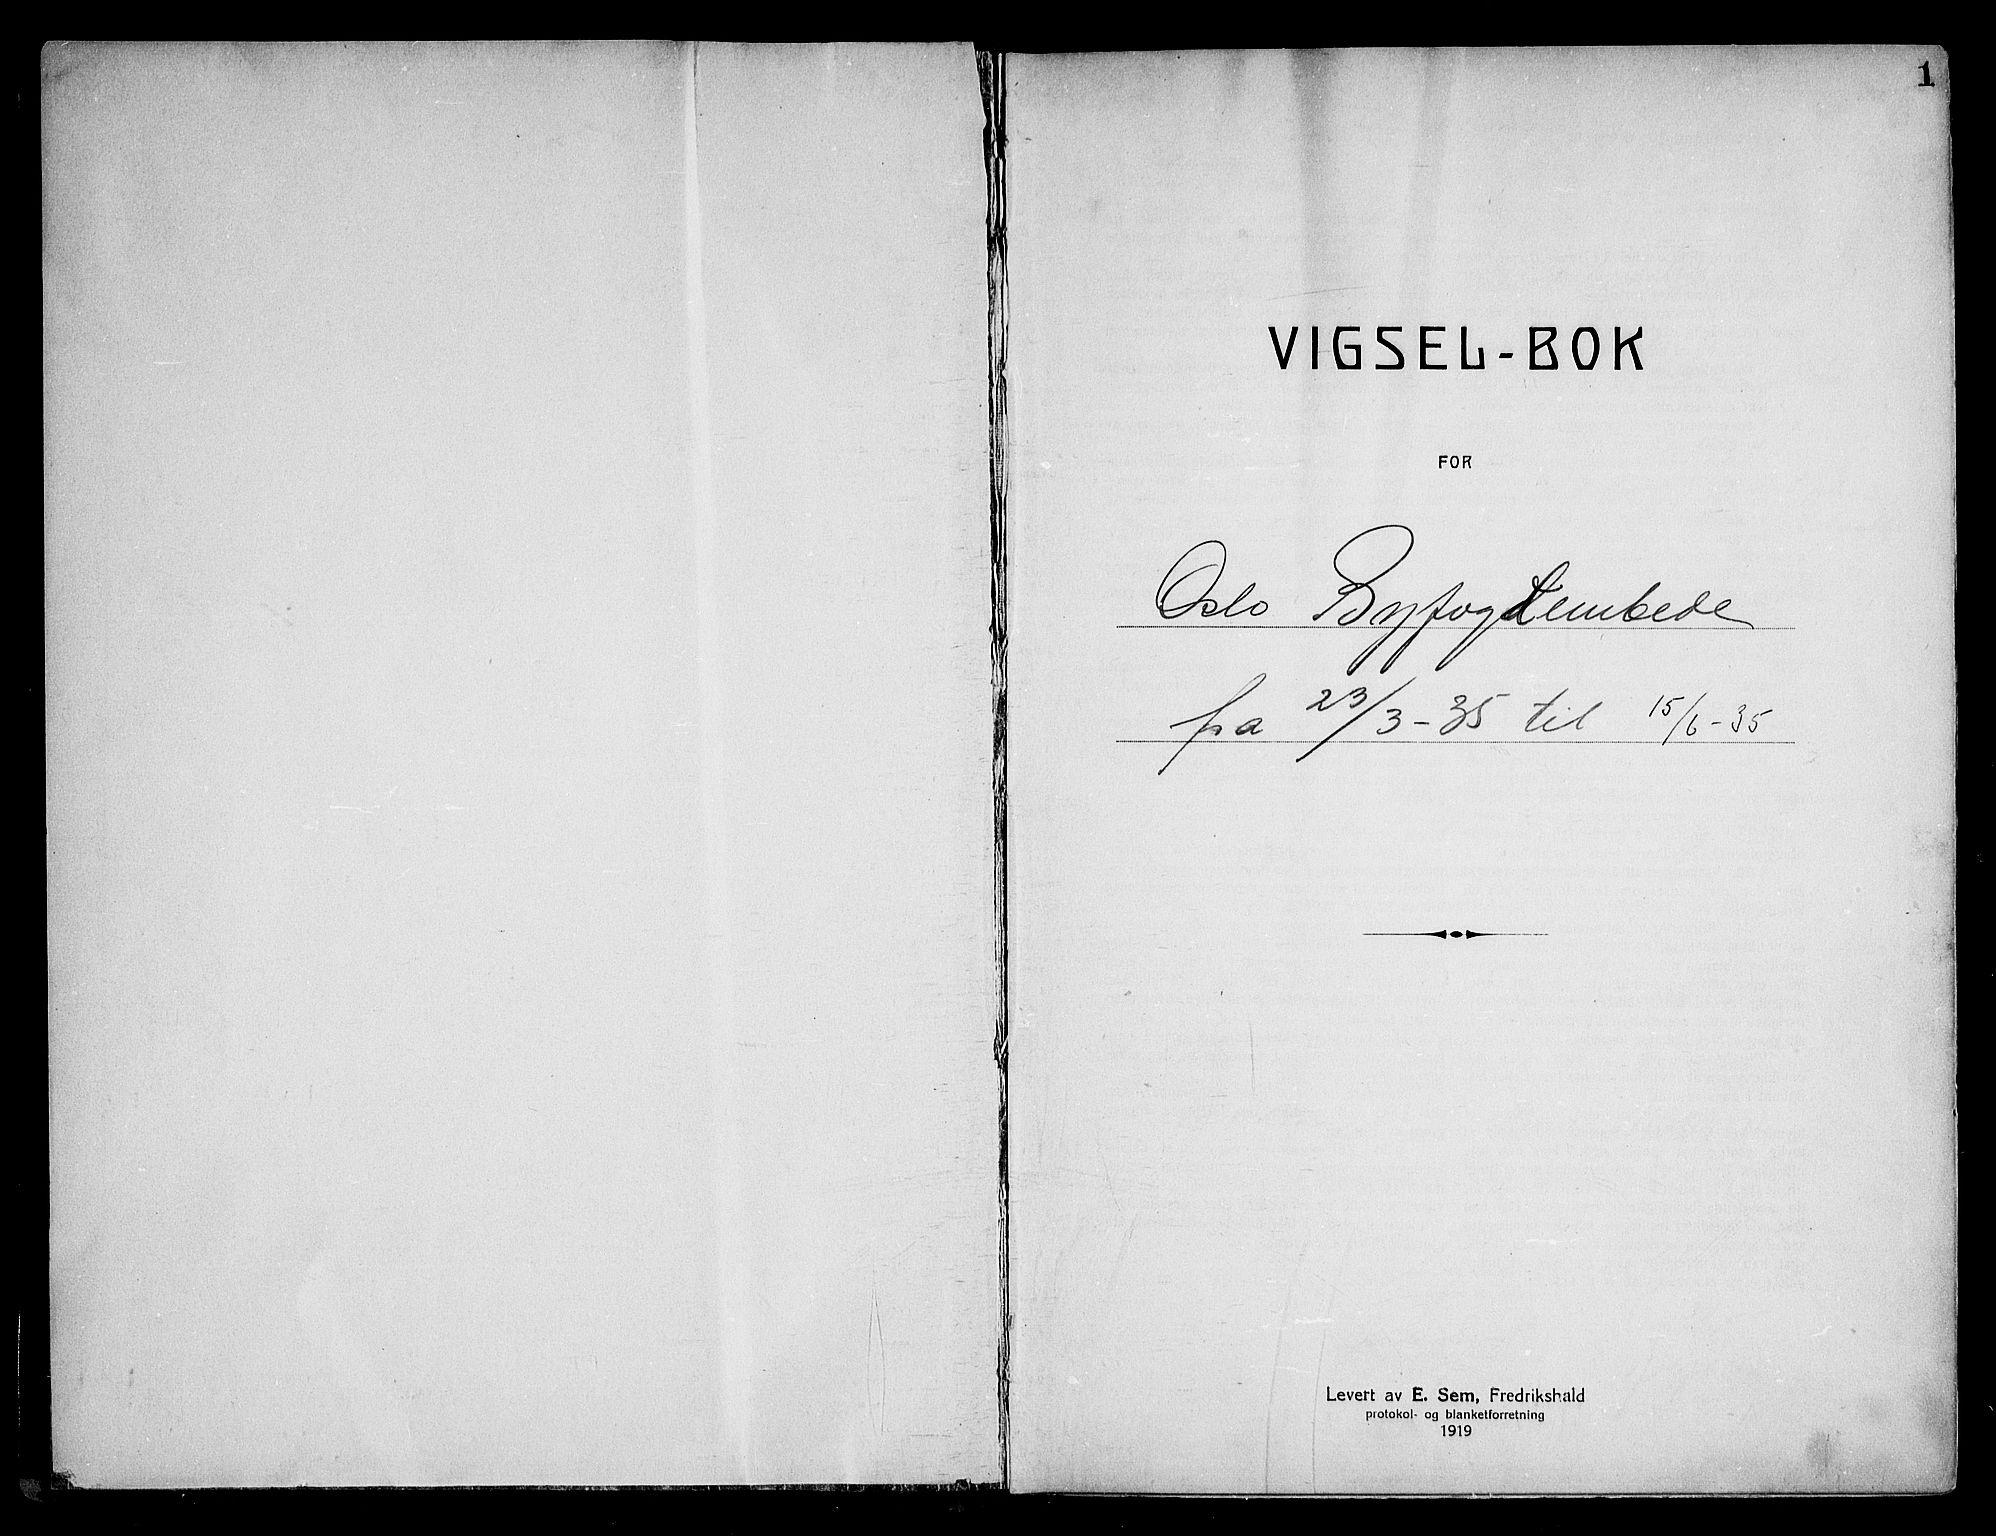 SAO, Oslo byfogd avd. I, L/Lb/Lbb/L0025: Notarialprotokoll, rekke II: Vigsler, 1935-1936, s. 1a